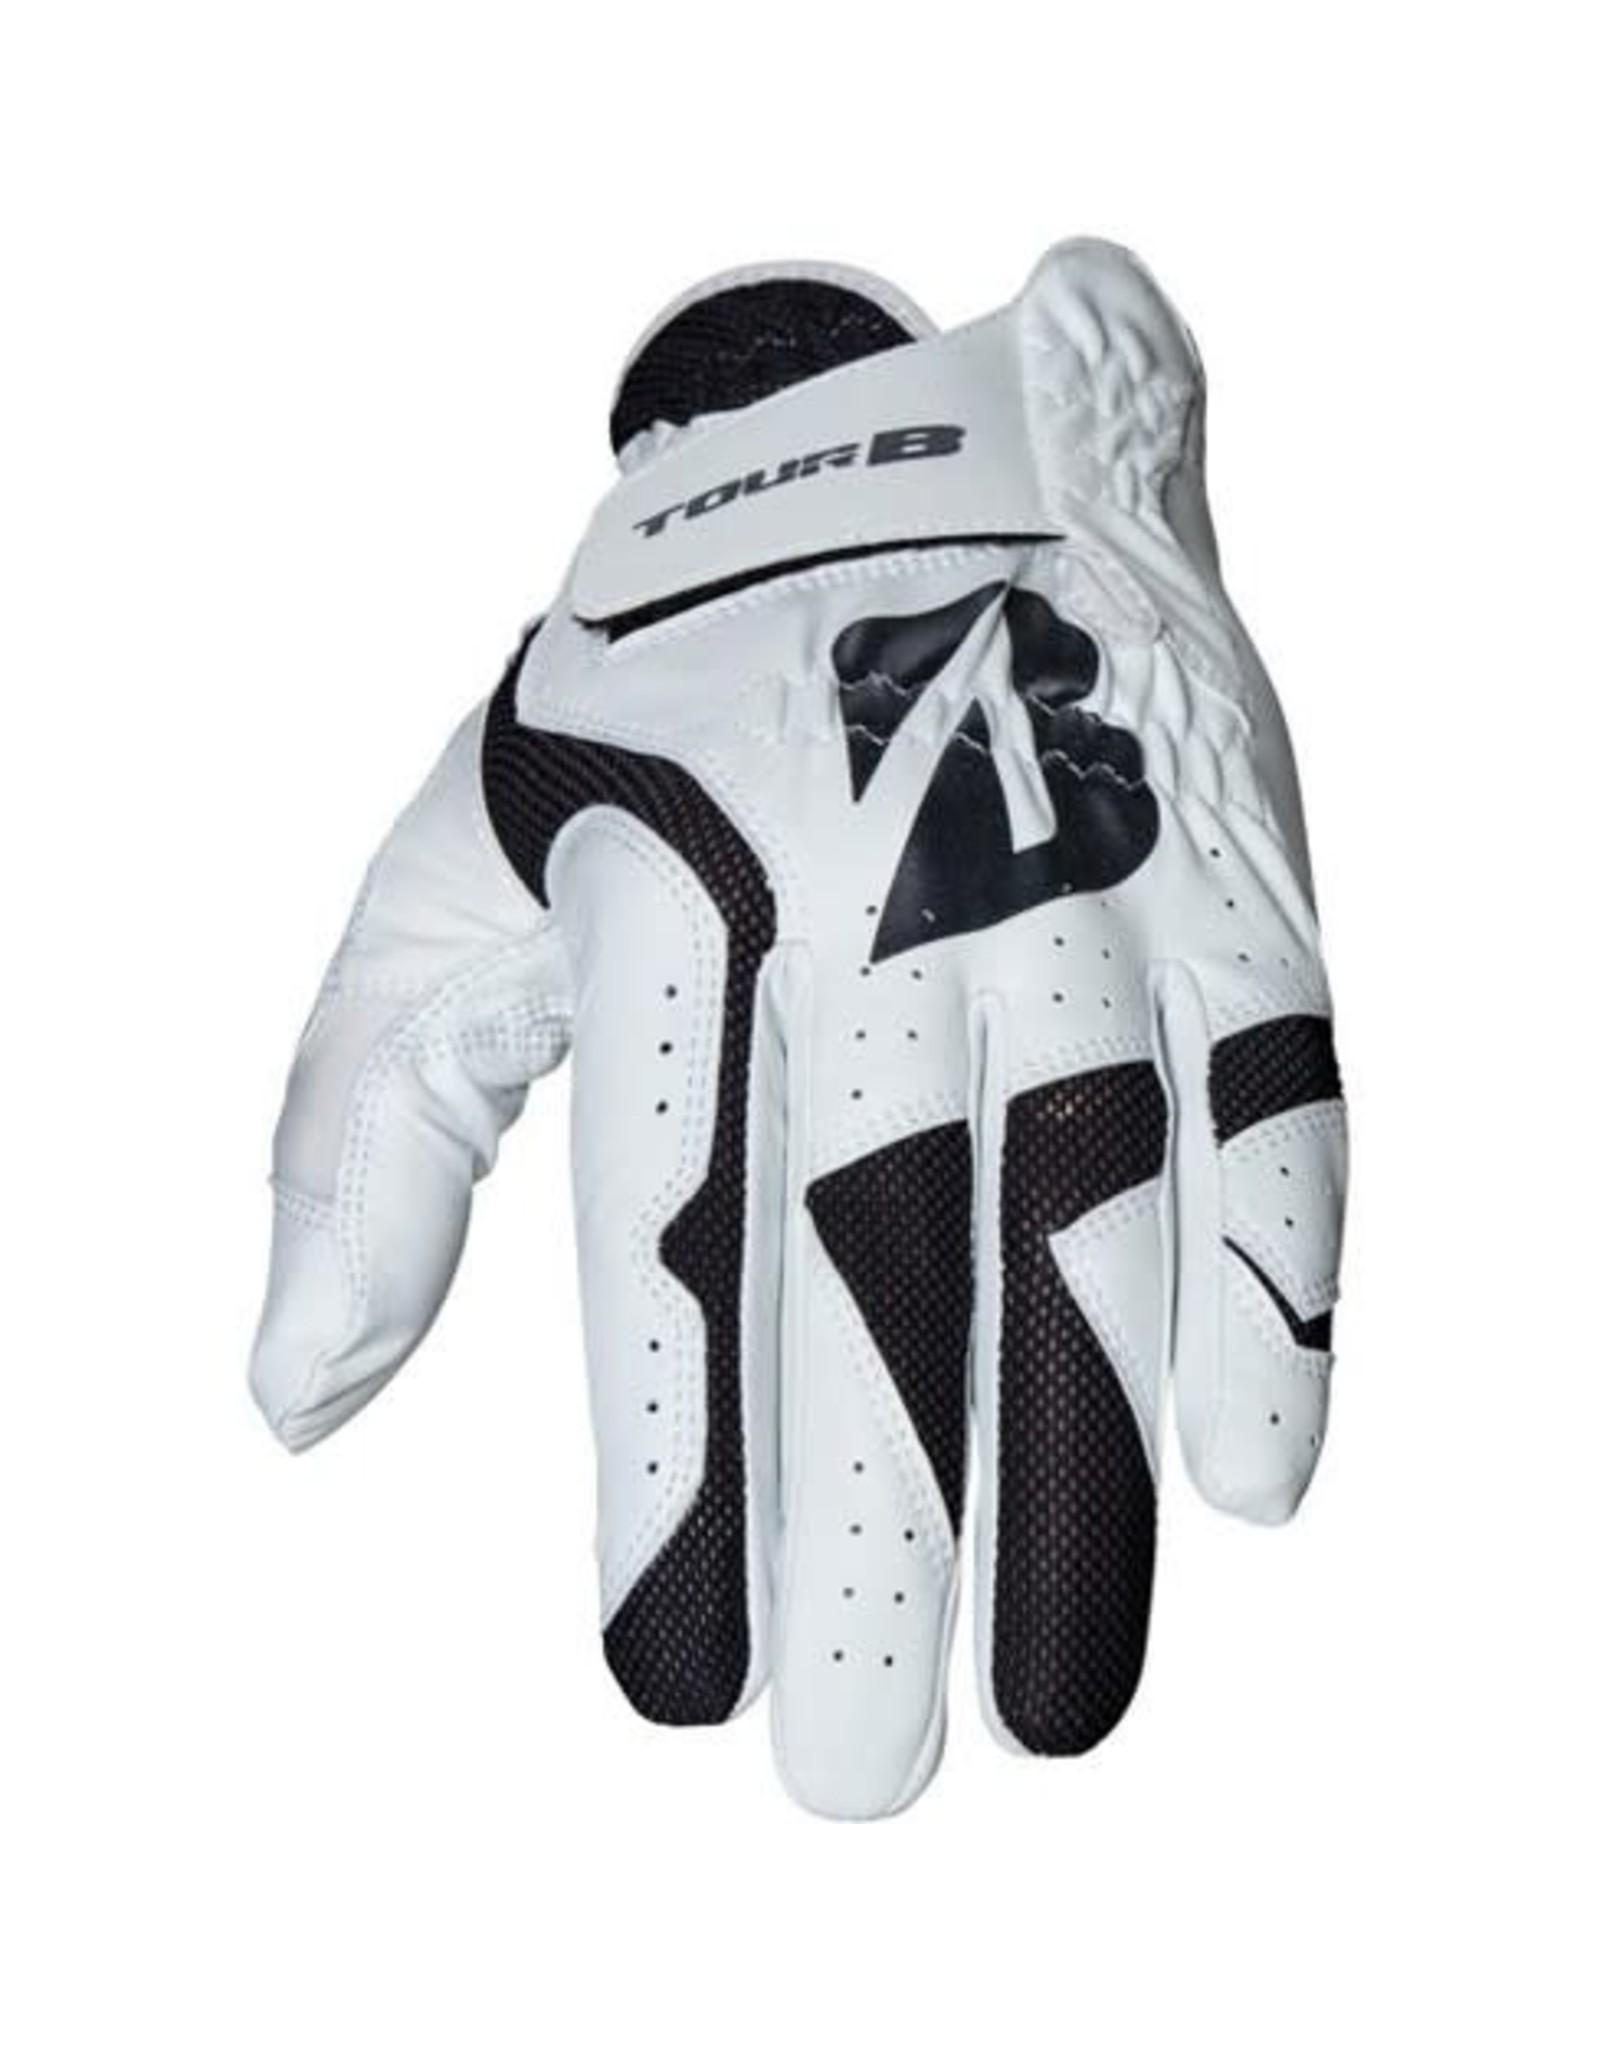 Bridgestone Bridgestone Tour B Fit Glove